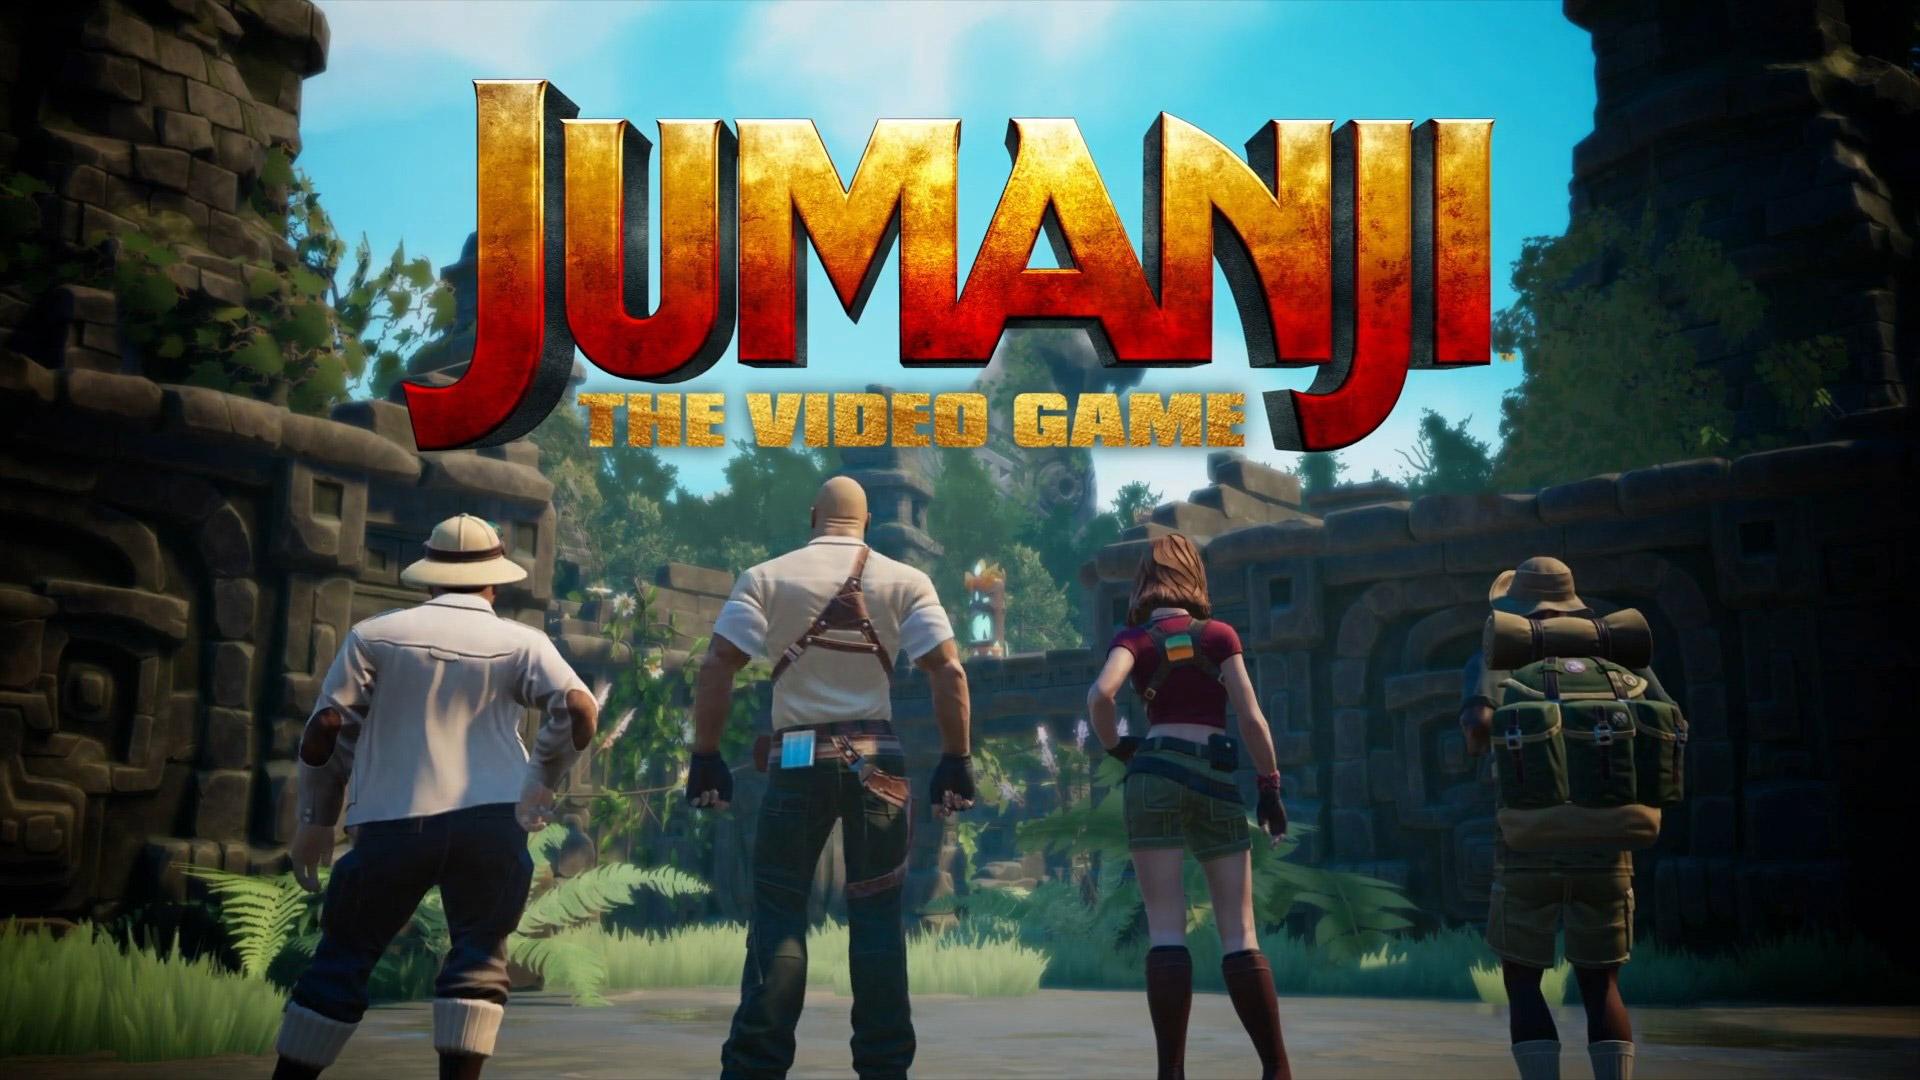 Free Jumanji: The Video Game Wallpaper in 1920x1080